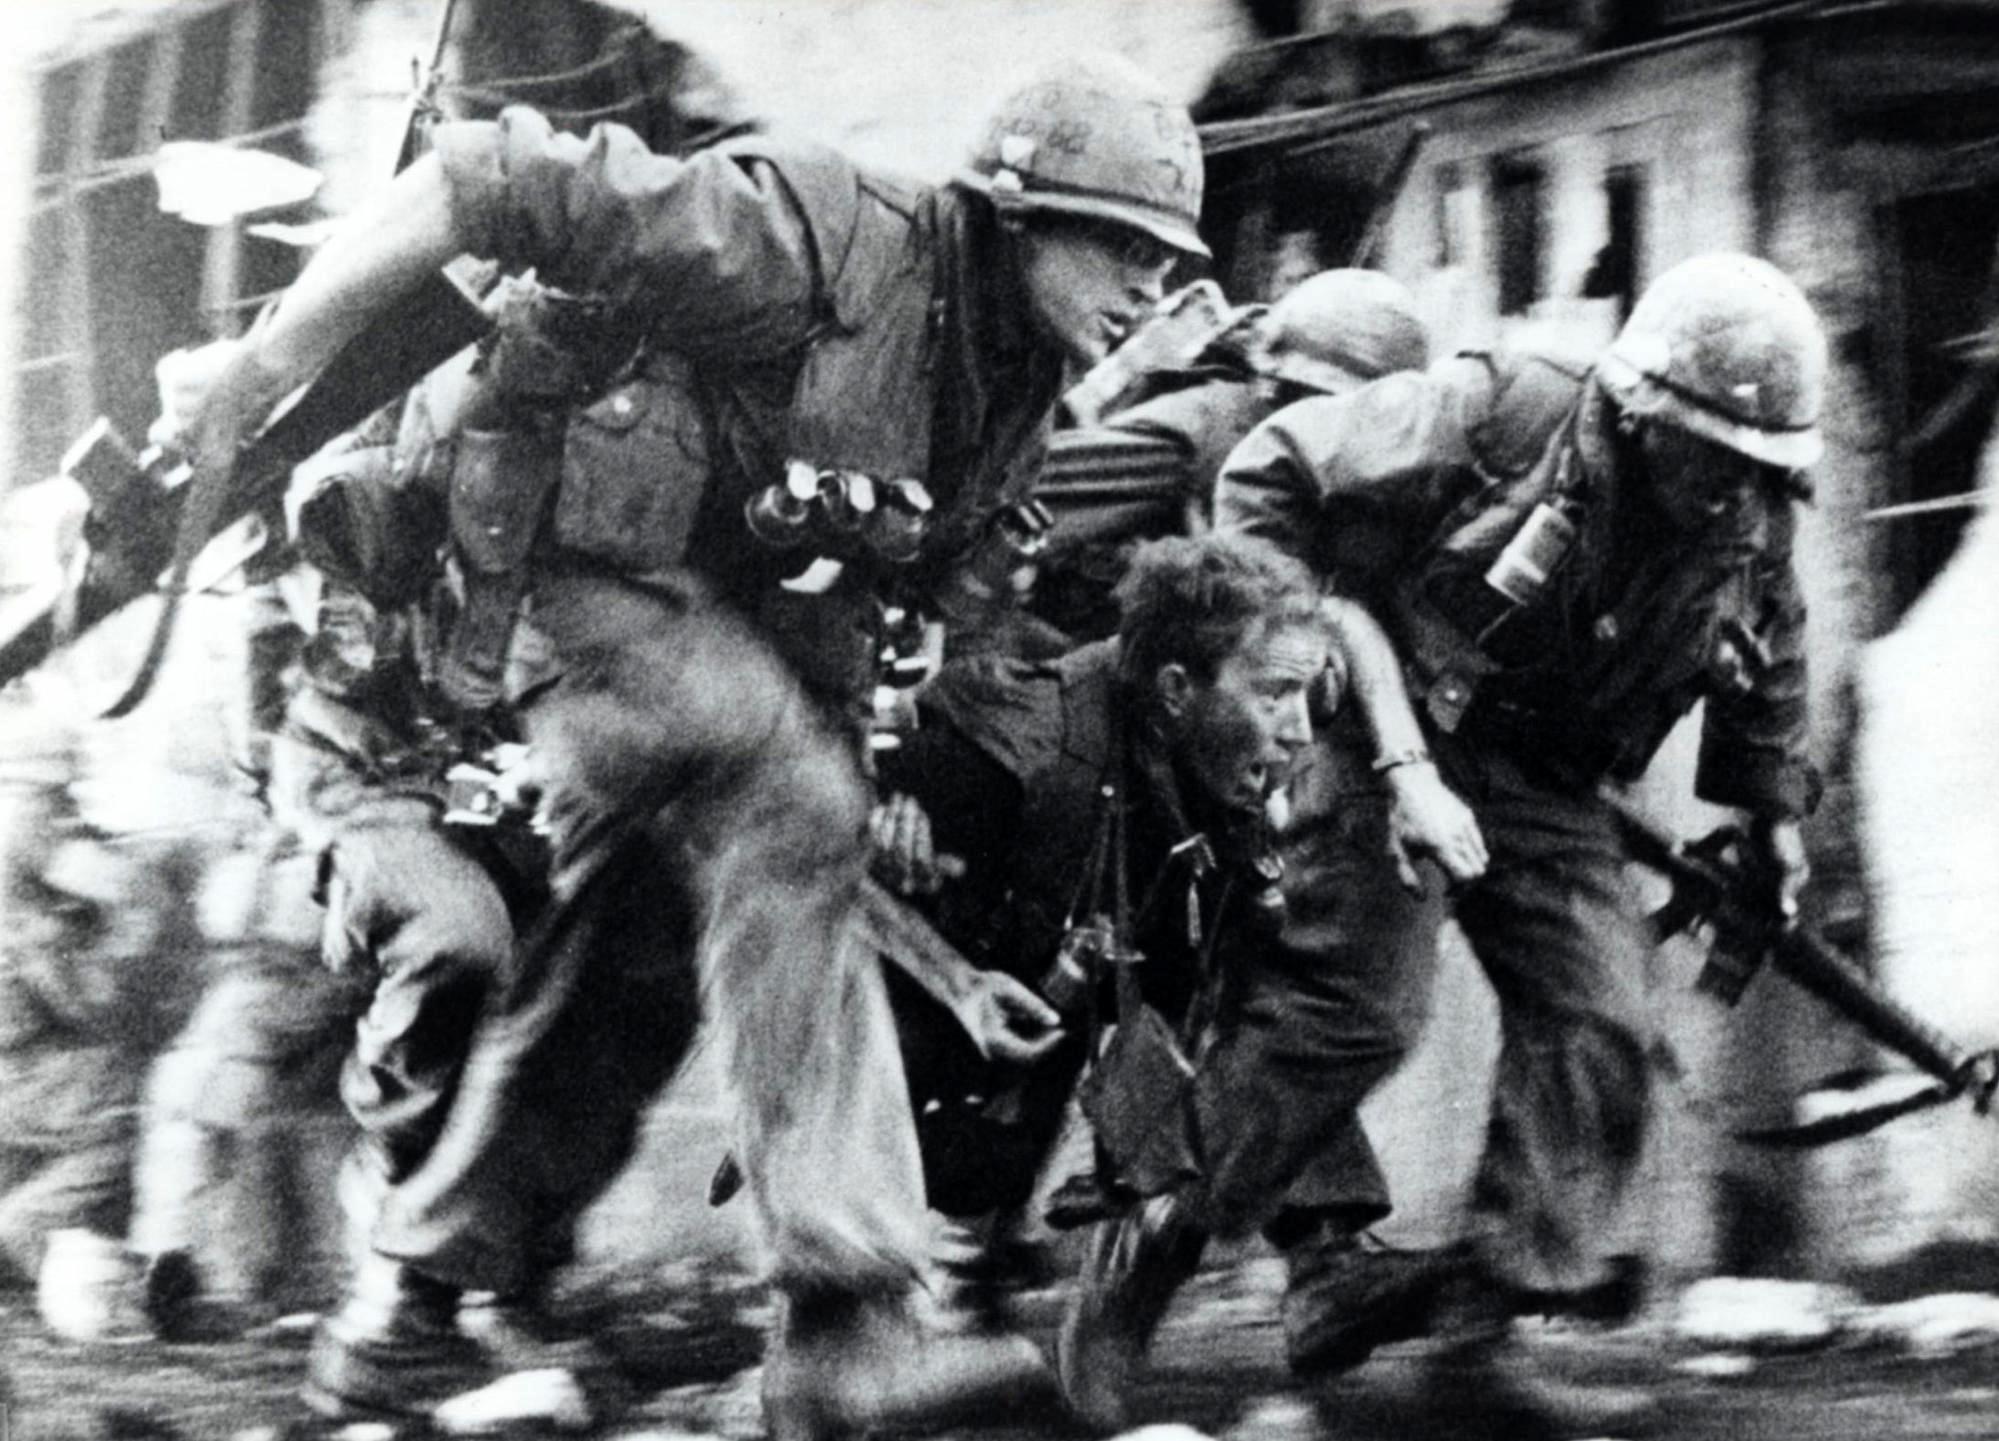 Full Metal Jacket - The unit under sniper fire